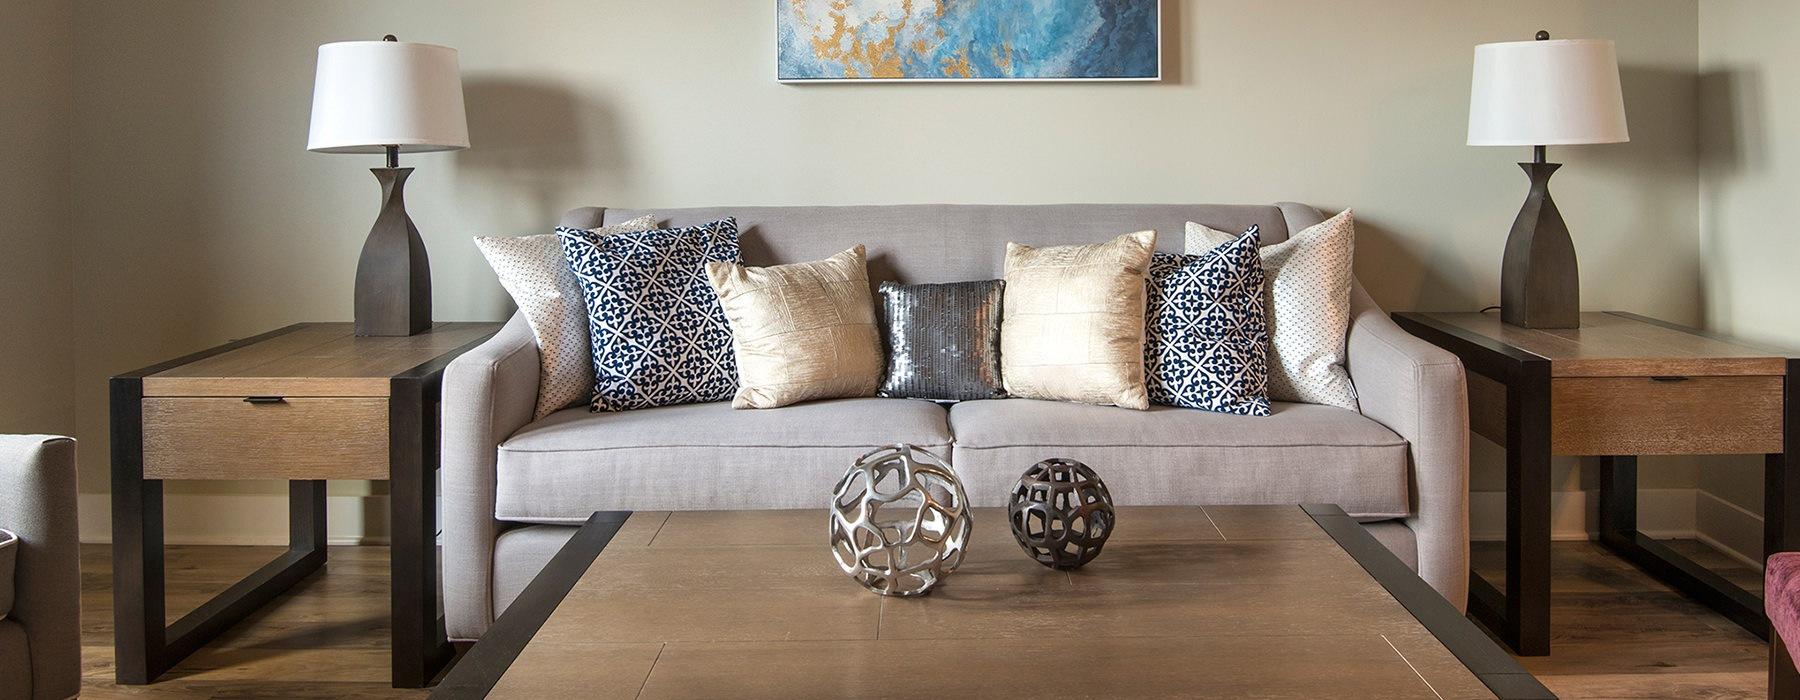 Beaucatcher Flats Living Room